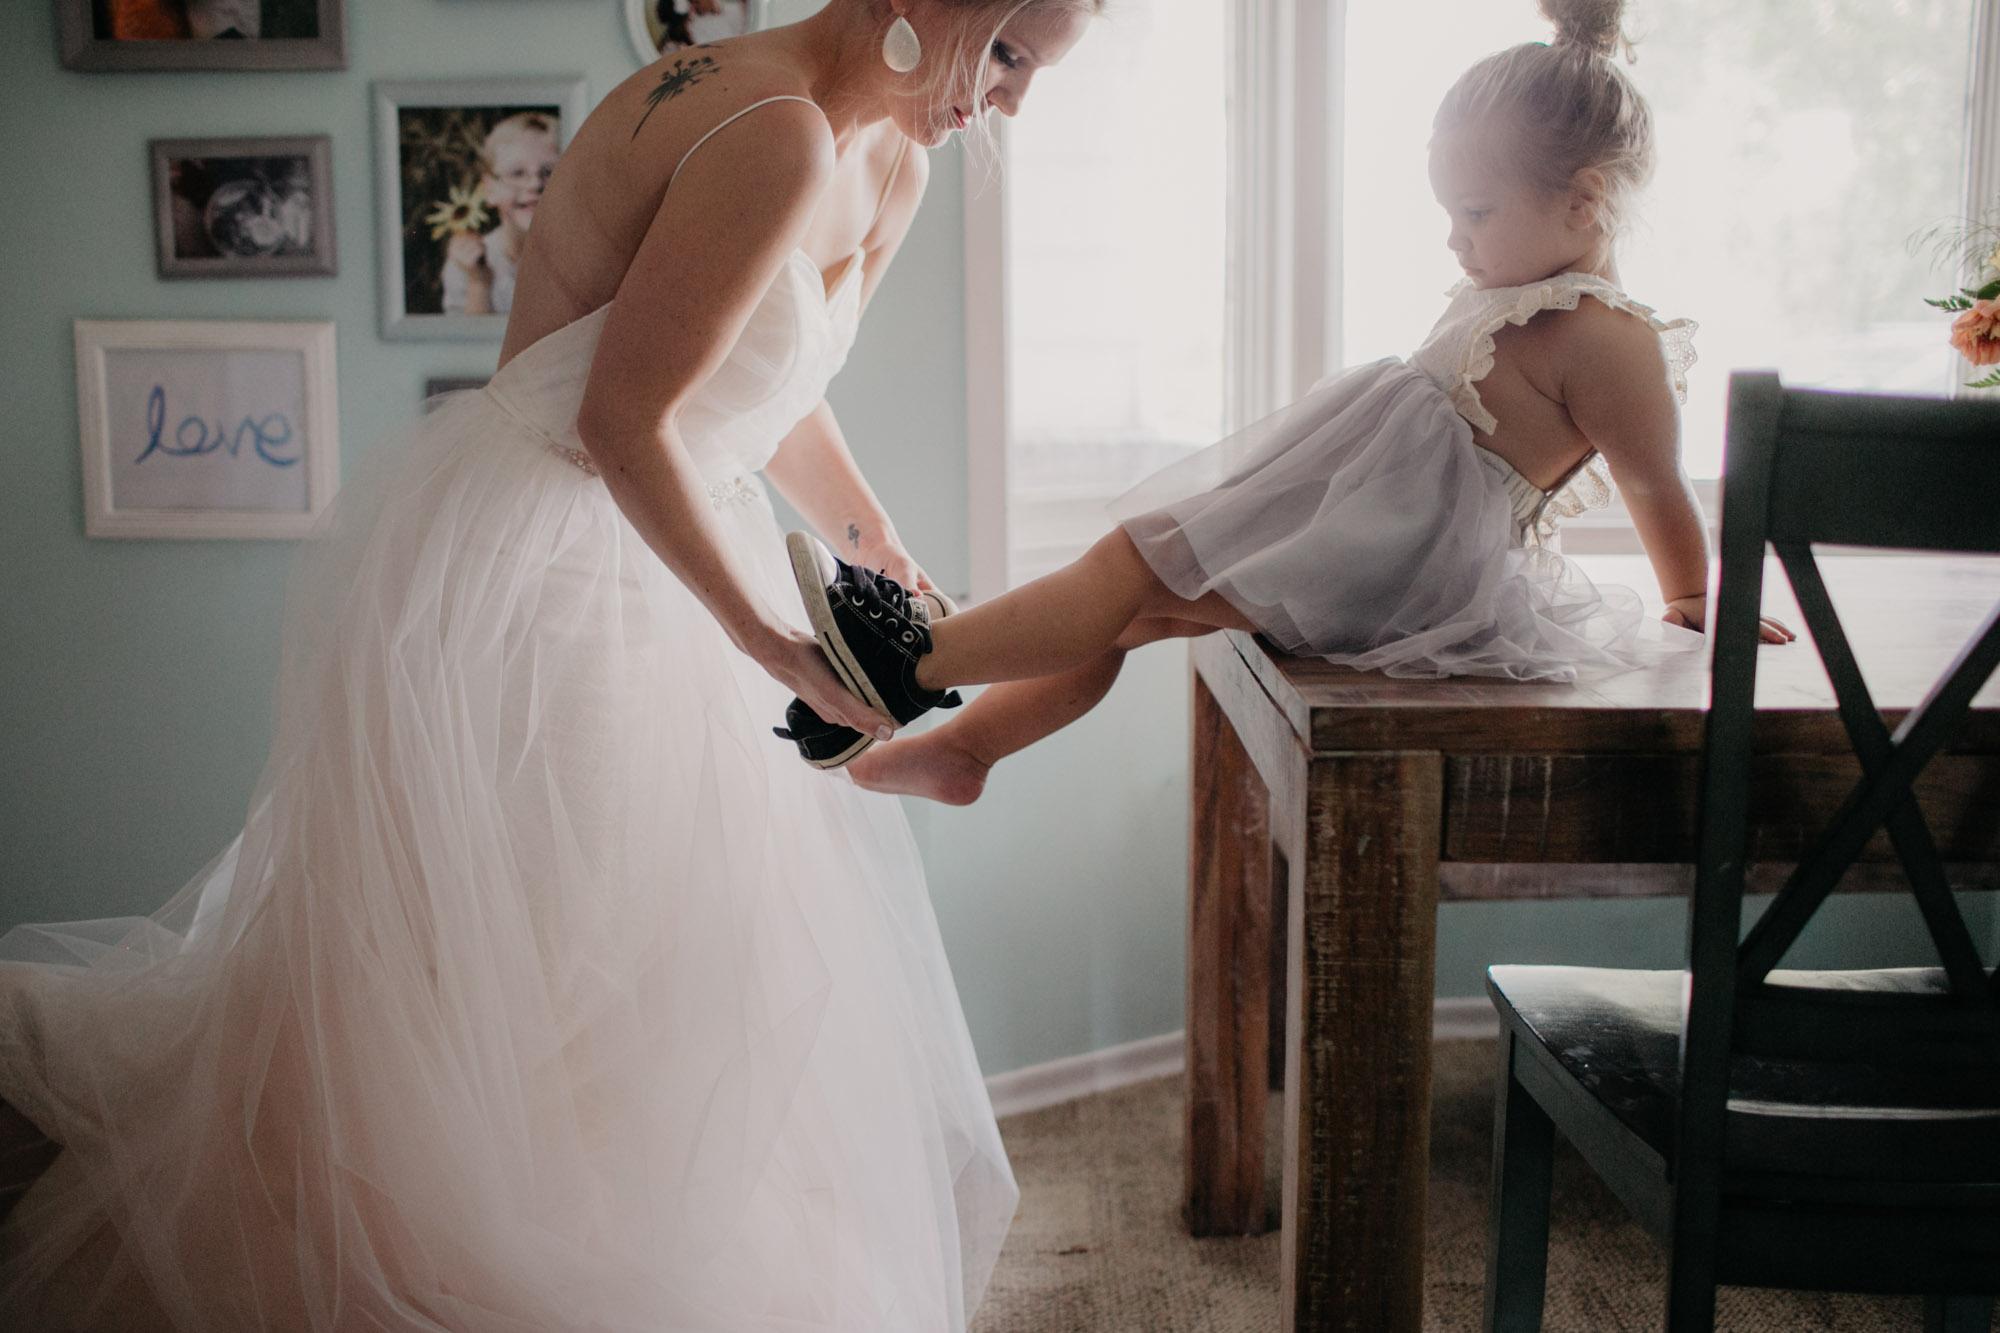 omaha-wedding-photographer-meghan-time-18.jpg